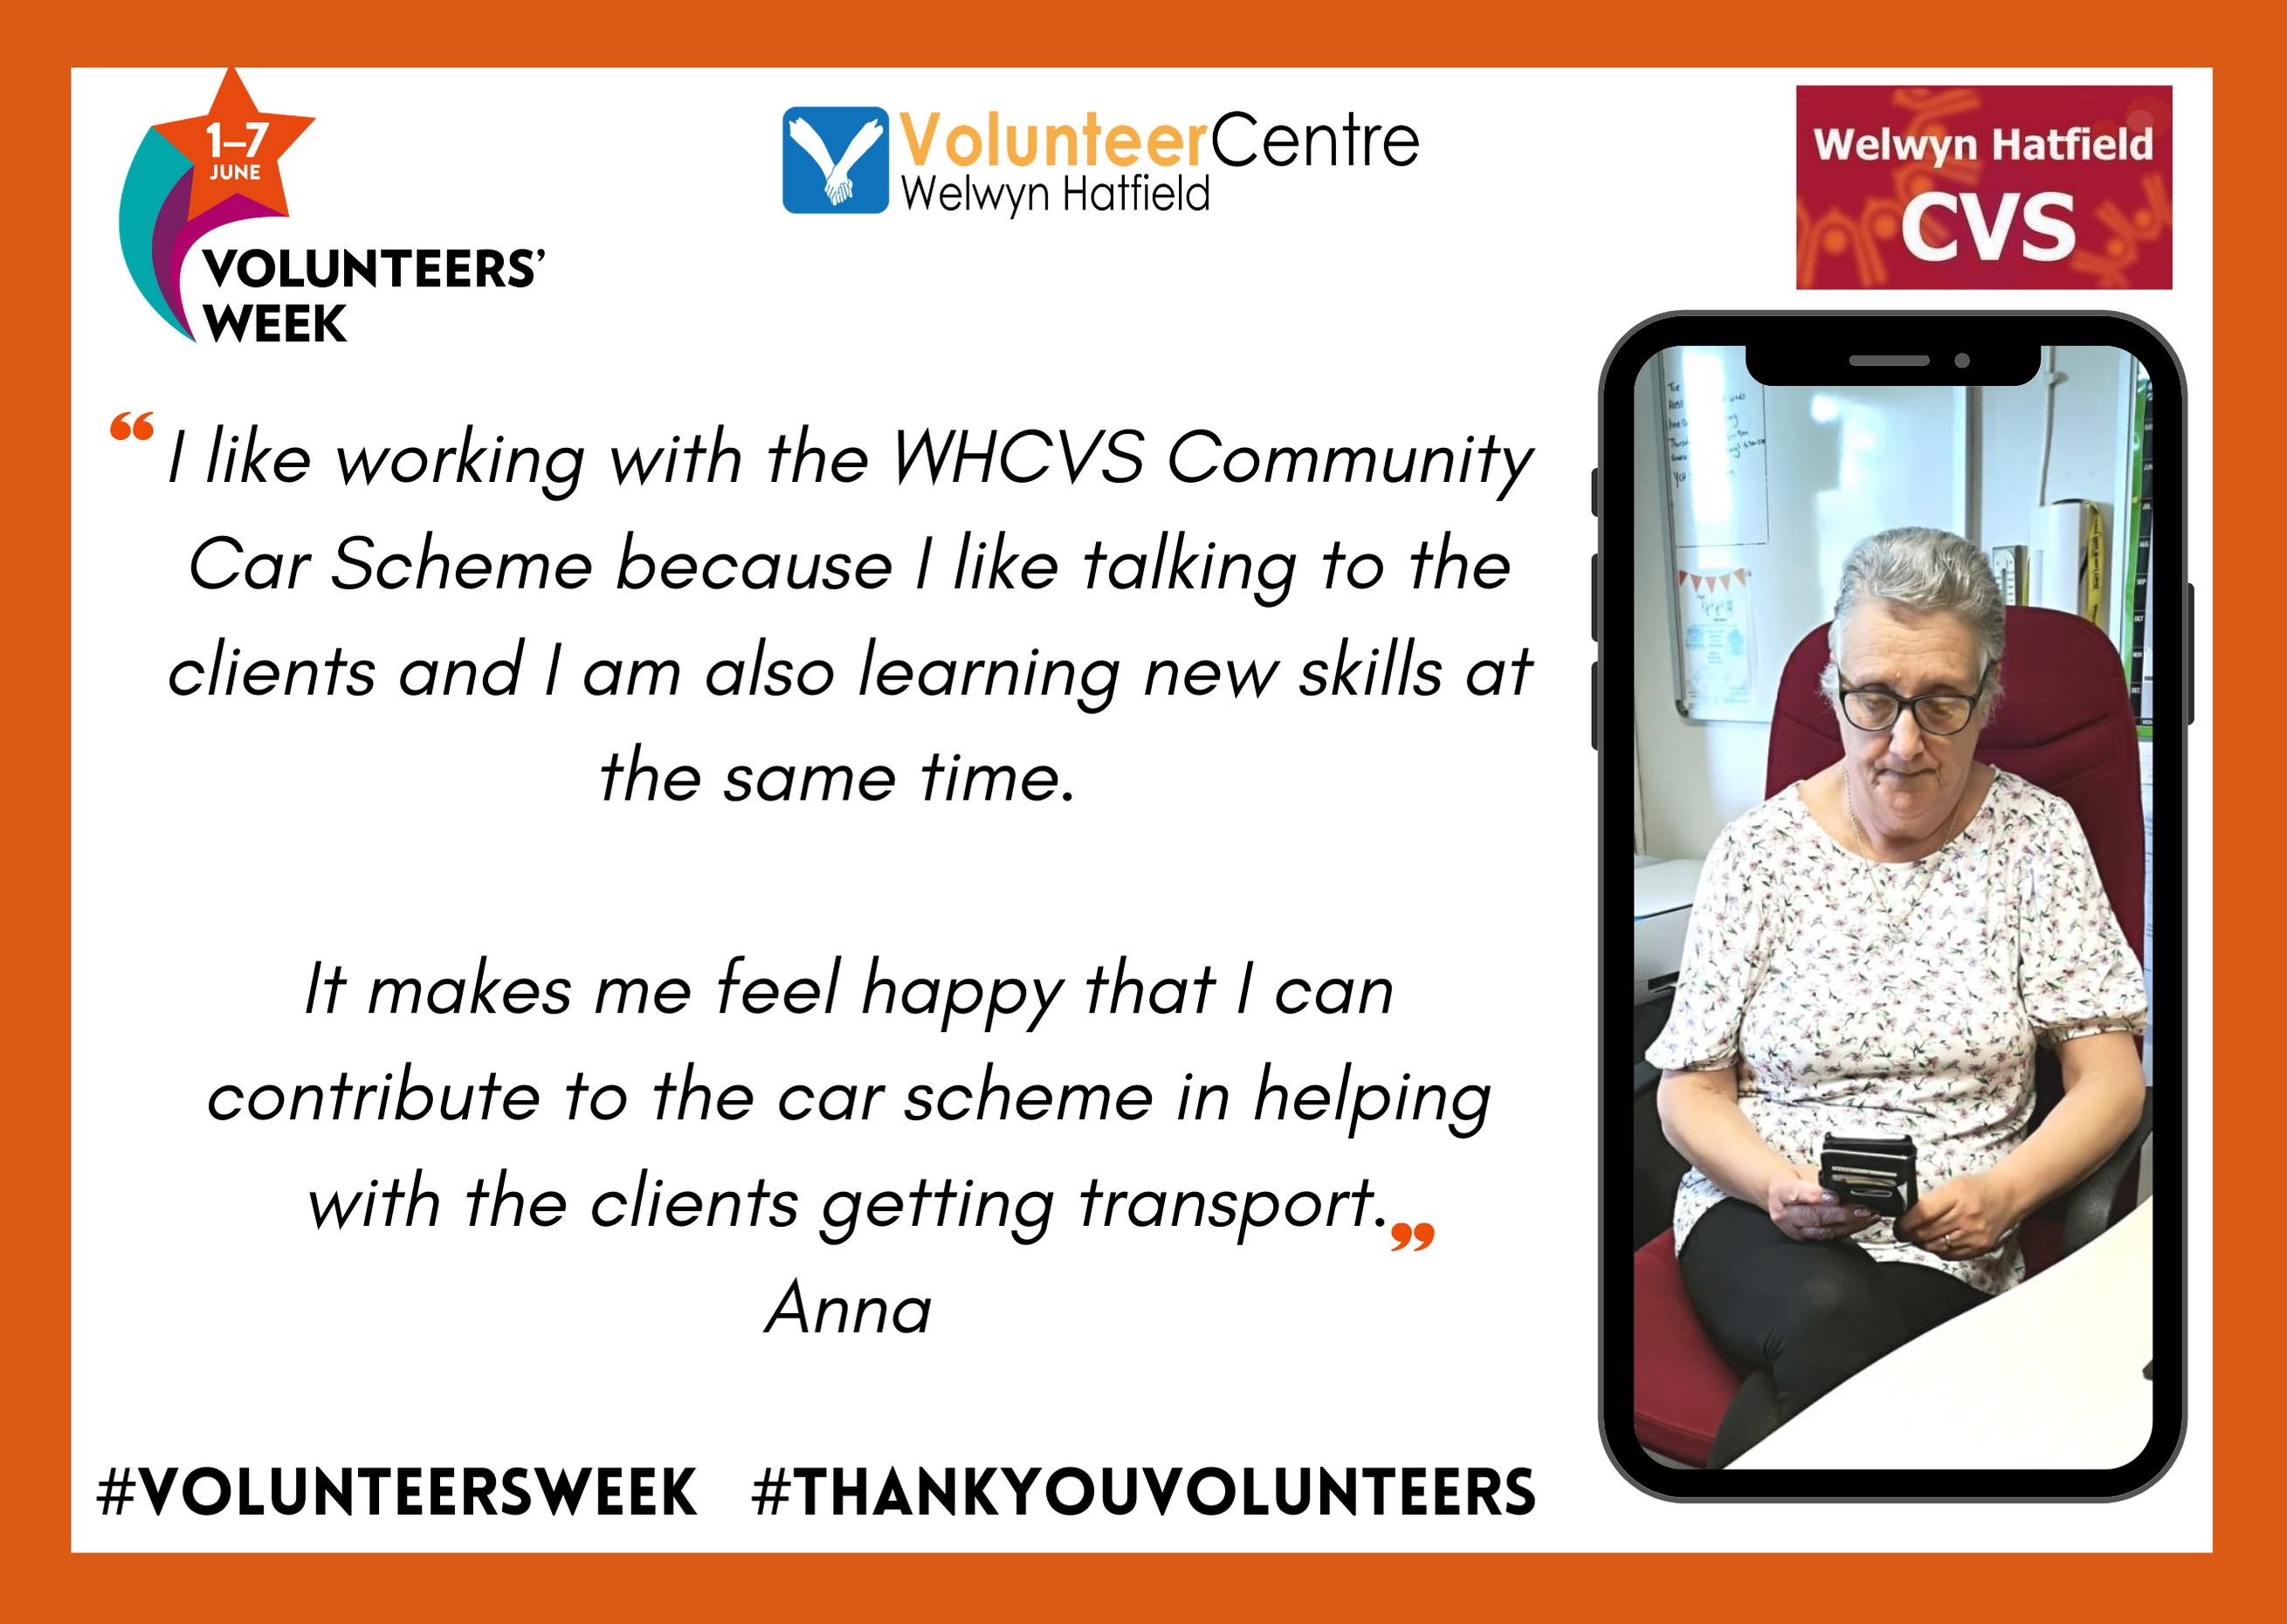 Anna – WHCVS Communit Car Scheme Volunteer